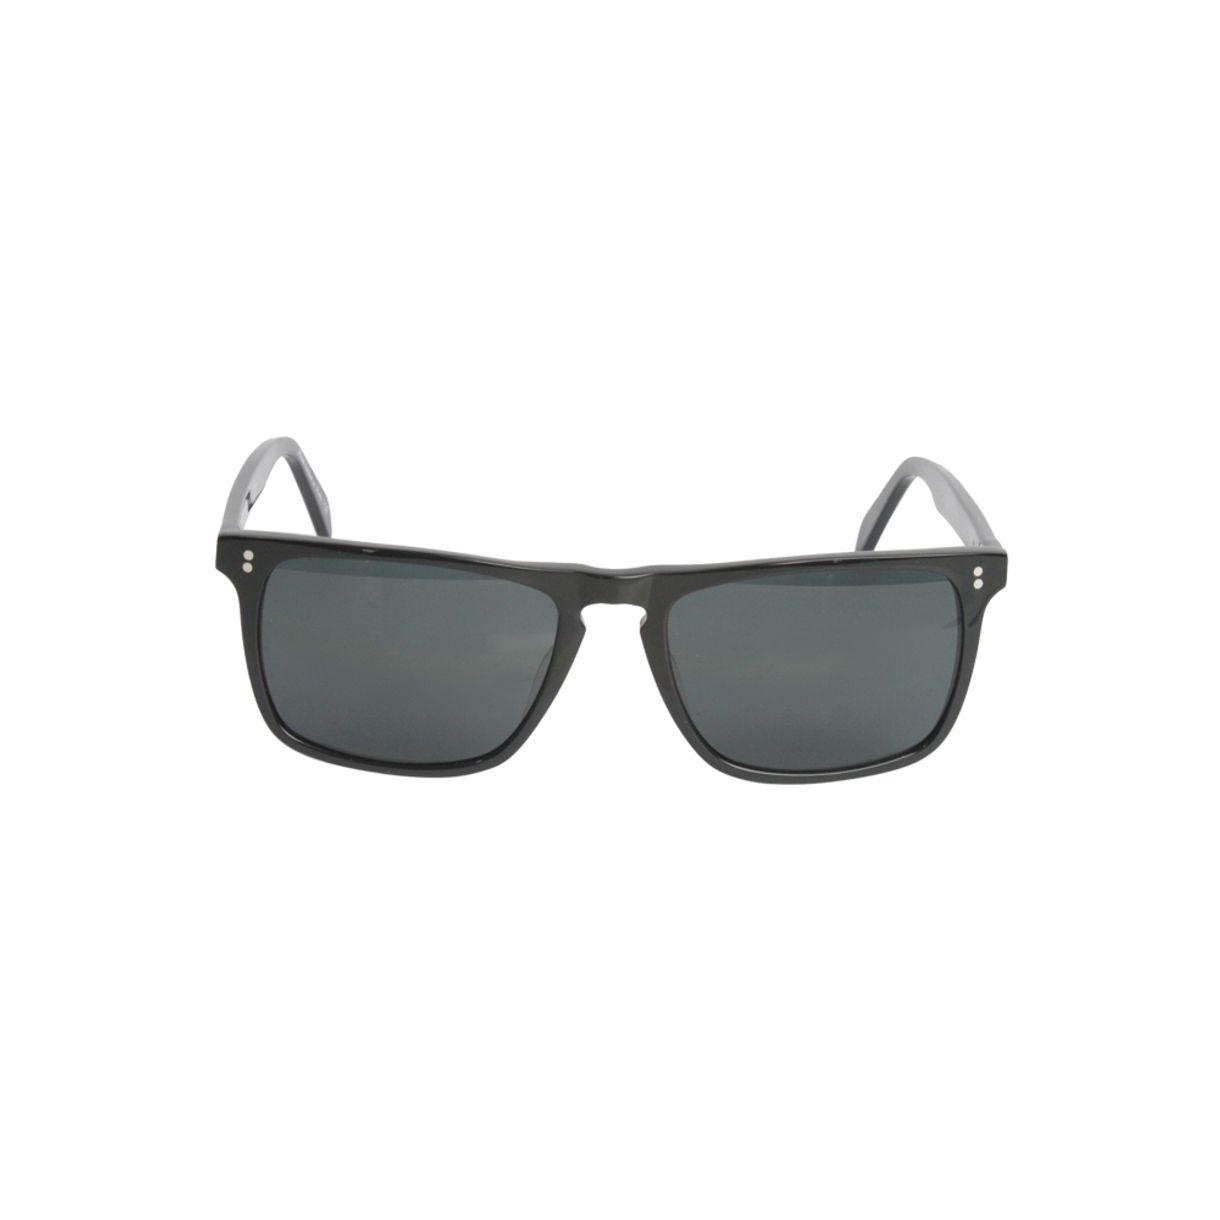 Oculos-Jimmy-Choo-Andie-E-Prata